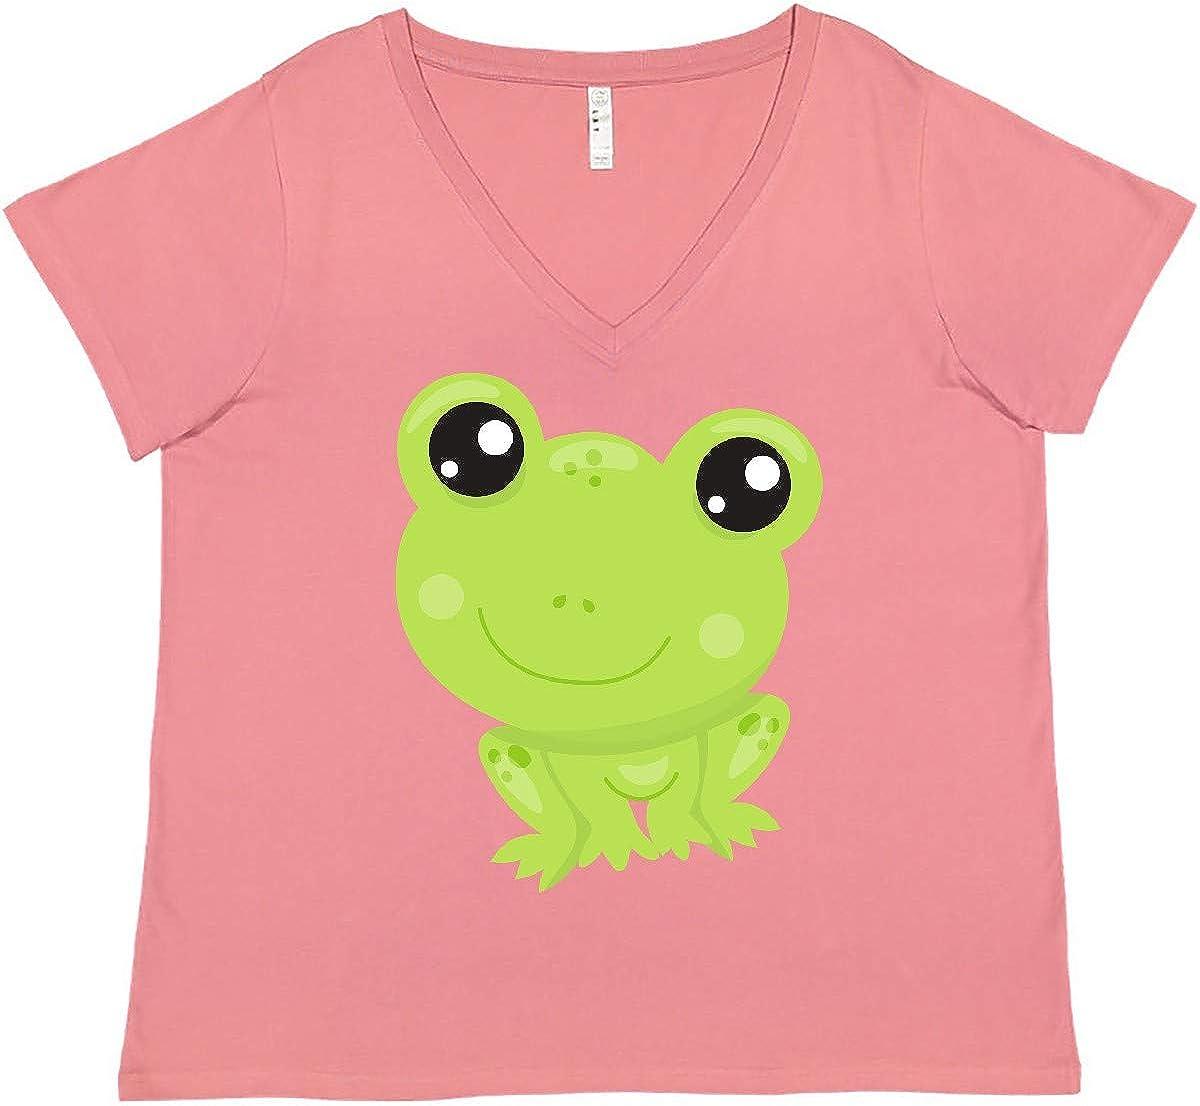 inktastic セール 激安通販専門店 Cute Frog Little Women's Green Baby